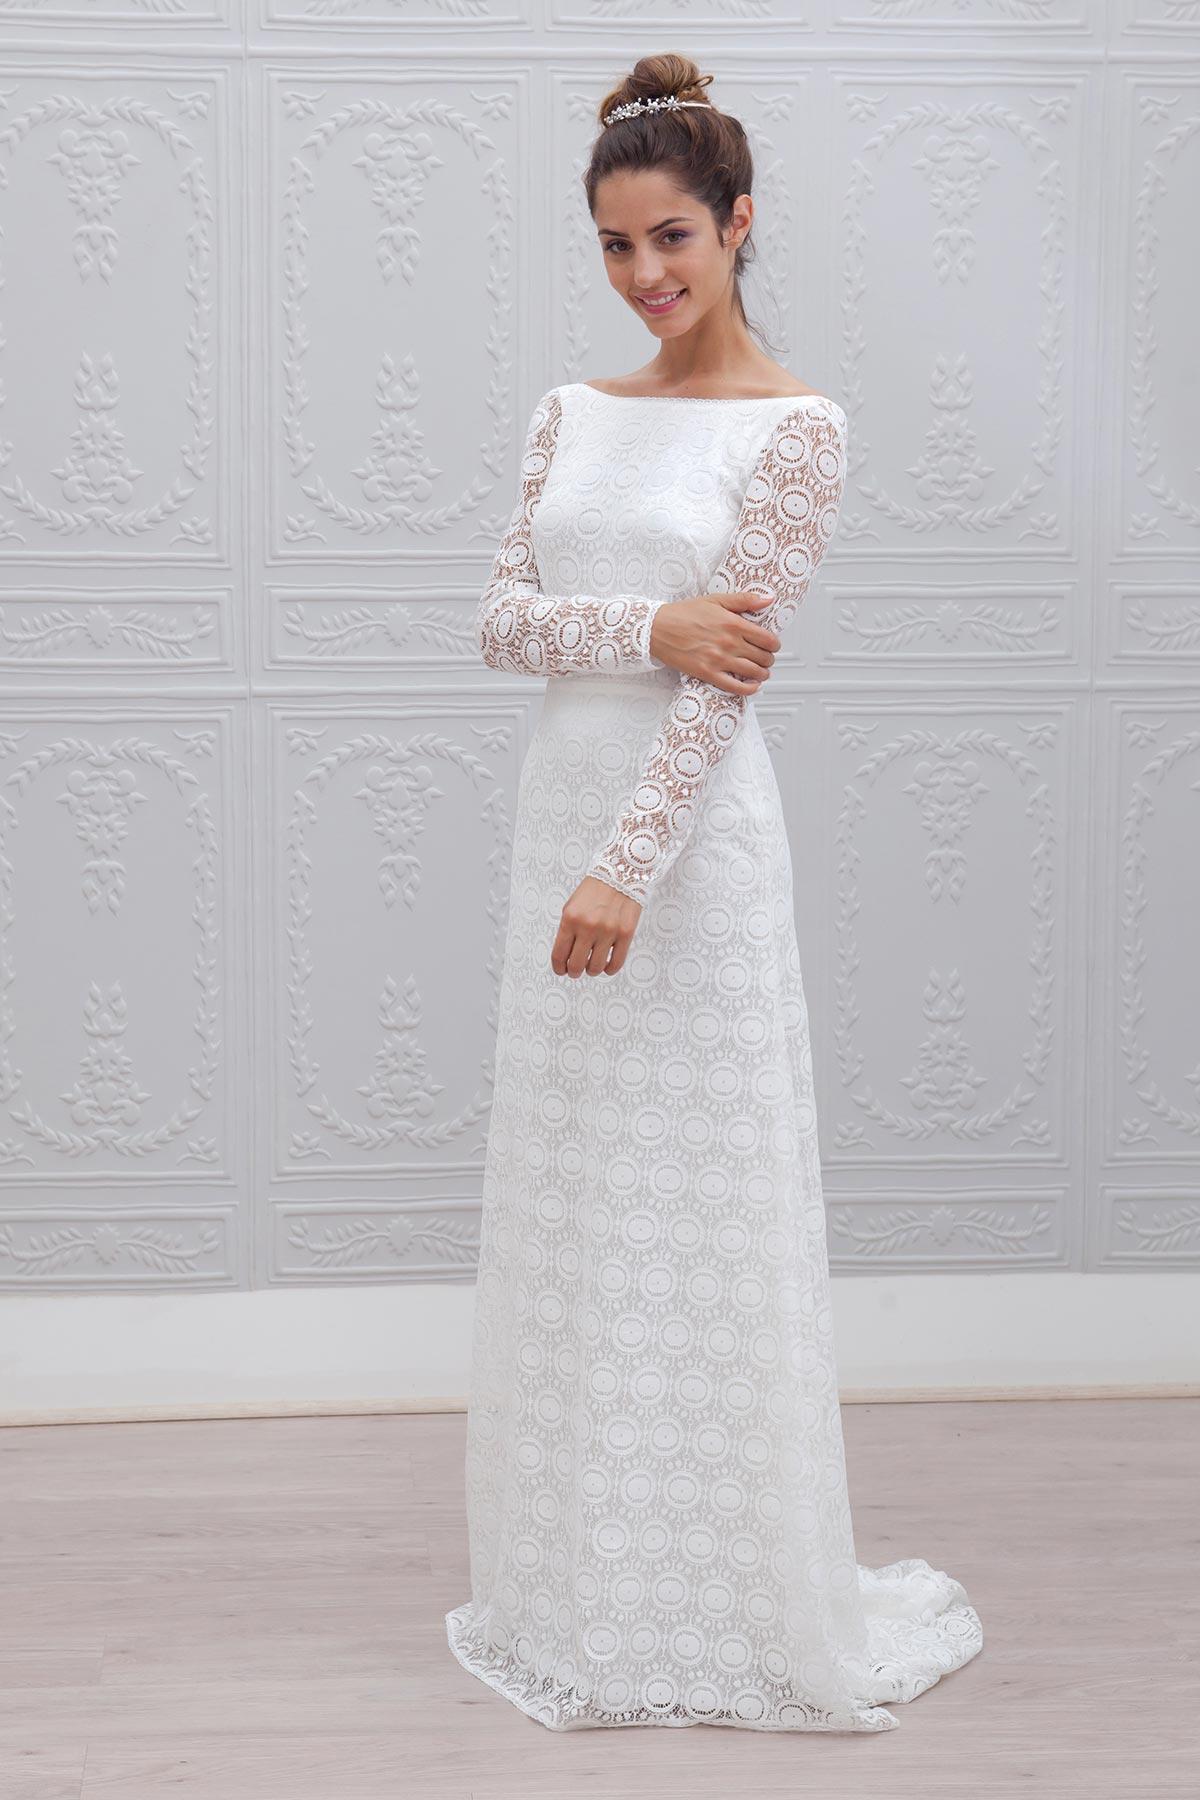 6545ac5b72759 Les robes fourreaux - Adelaide. Marie Laporte